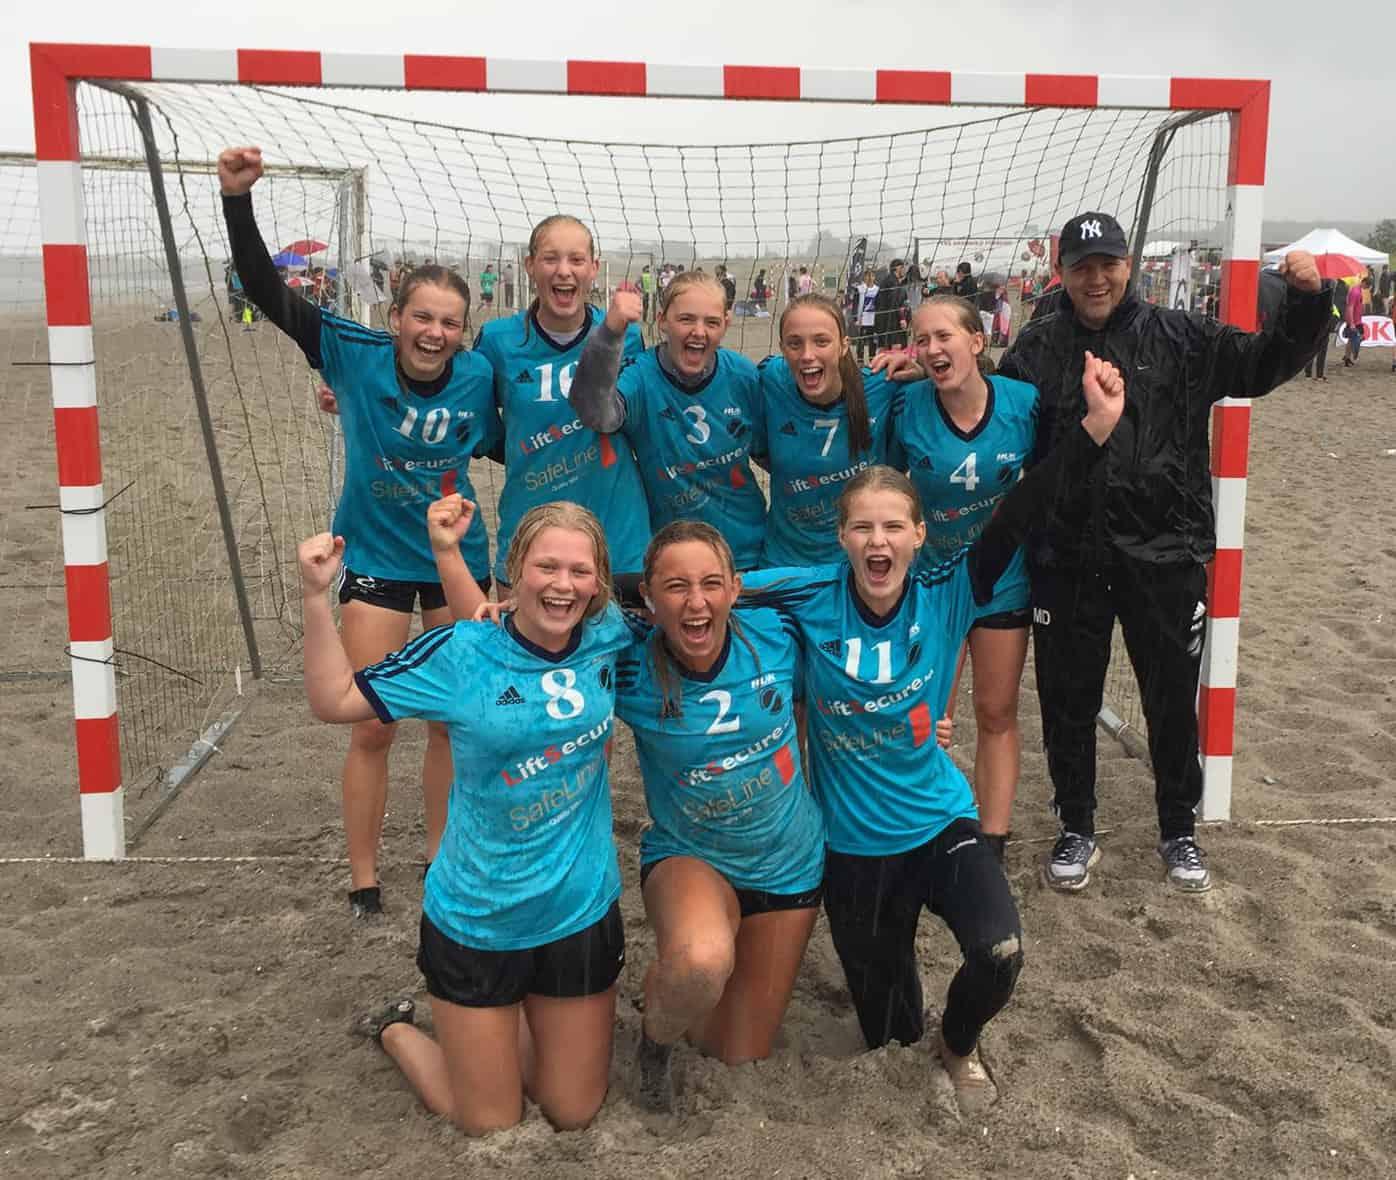 2018 Beach DM bronze